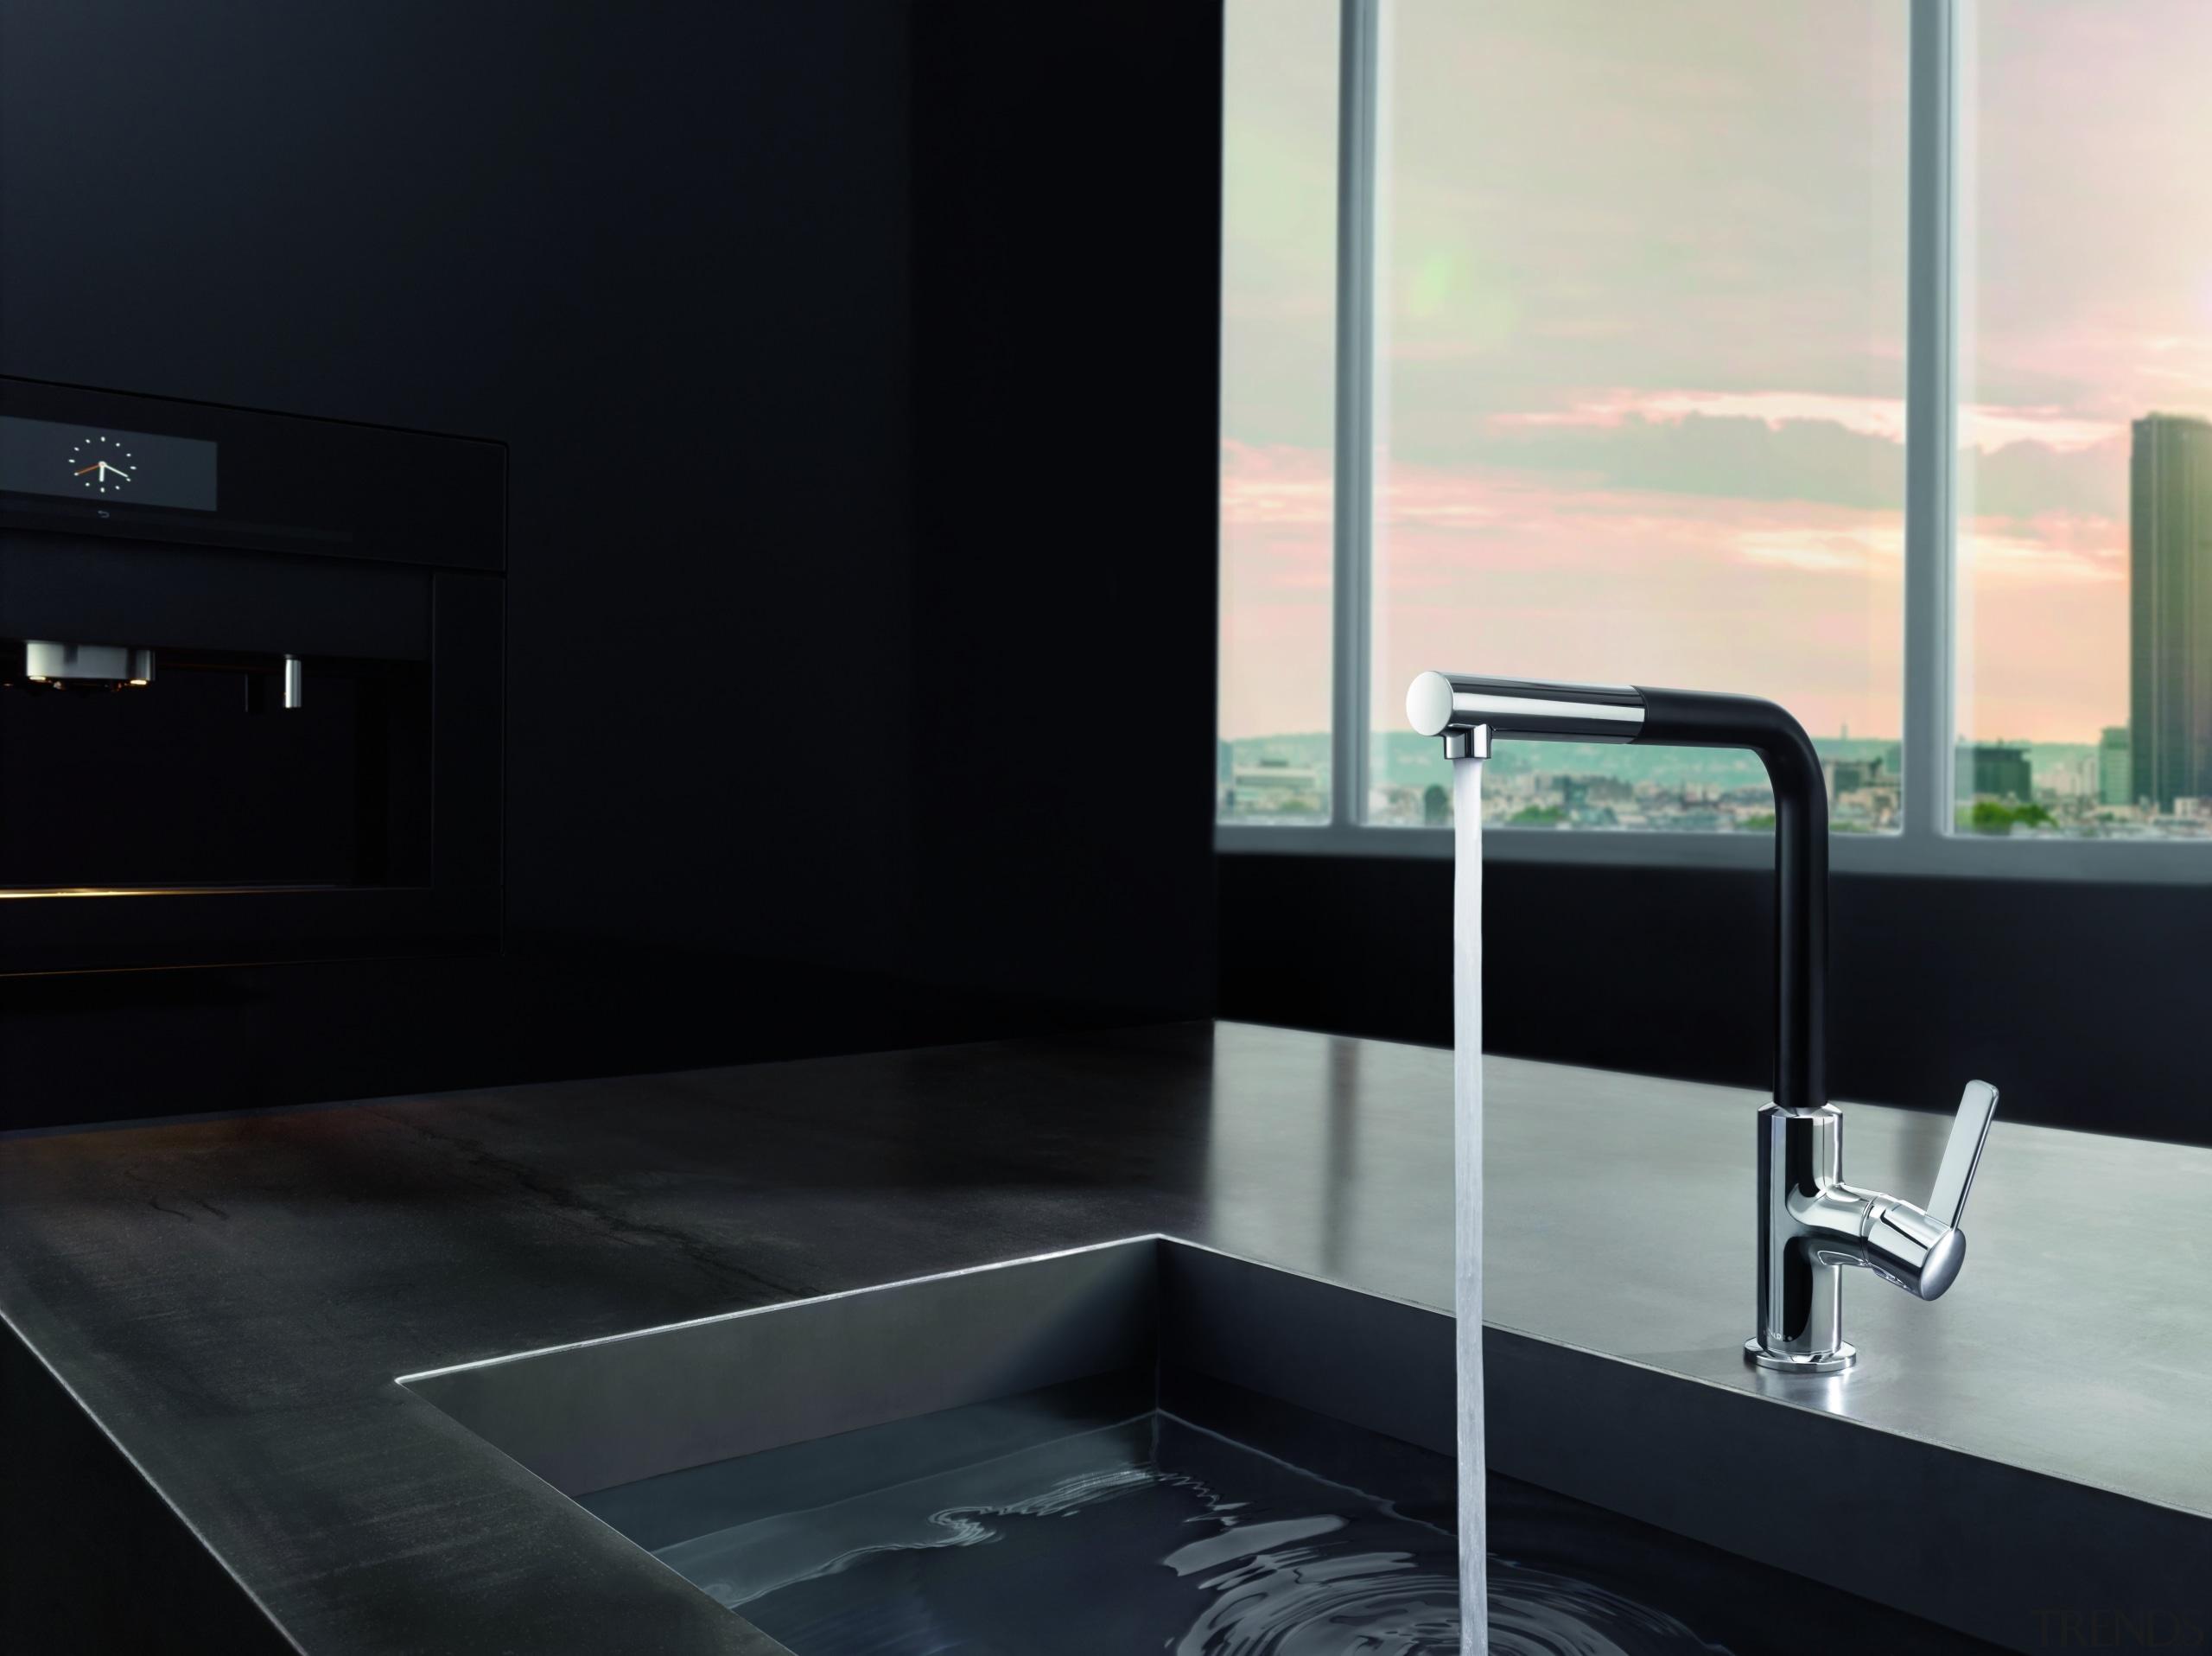 Foreno 2 - angle | architecture | bathroom angle, architecture, bathroom, countertop, glass, interior design, plumbing fixture, sink, tap, black